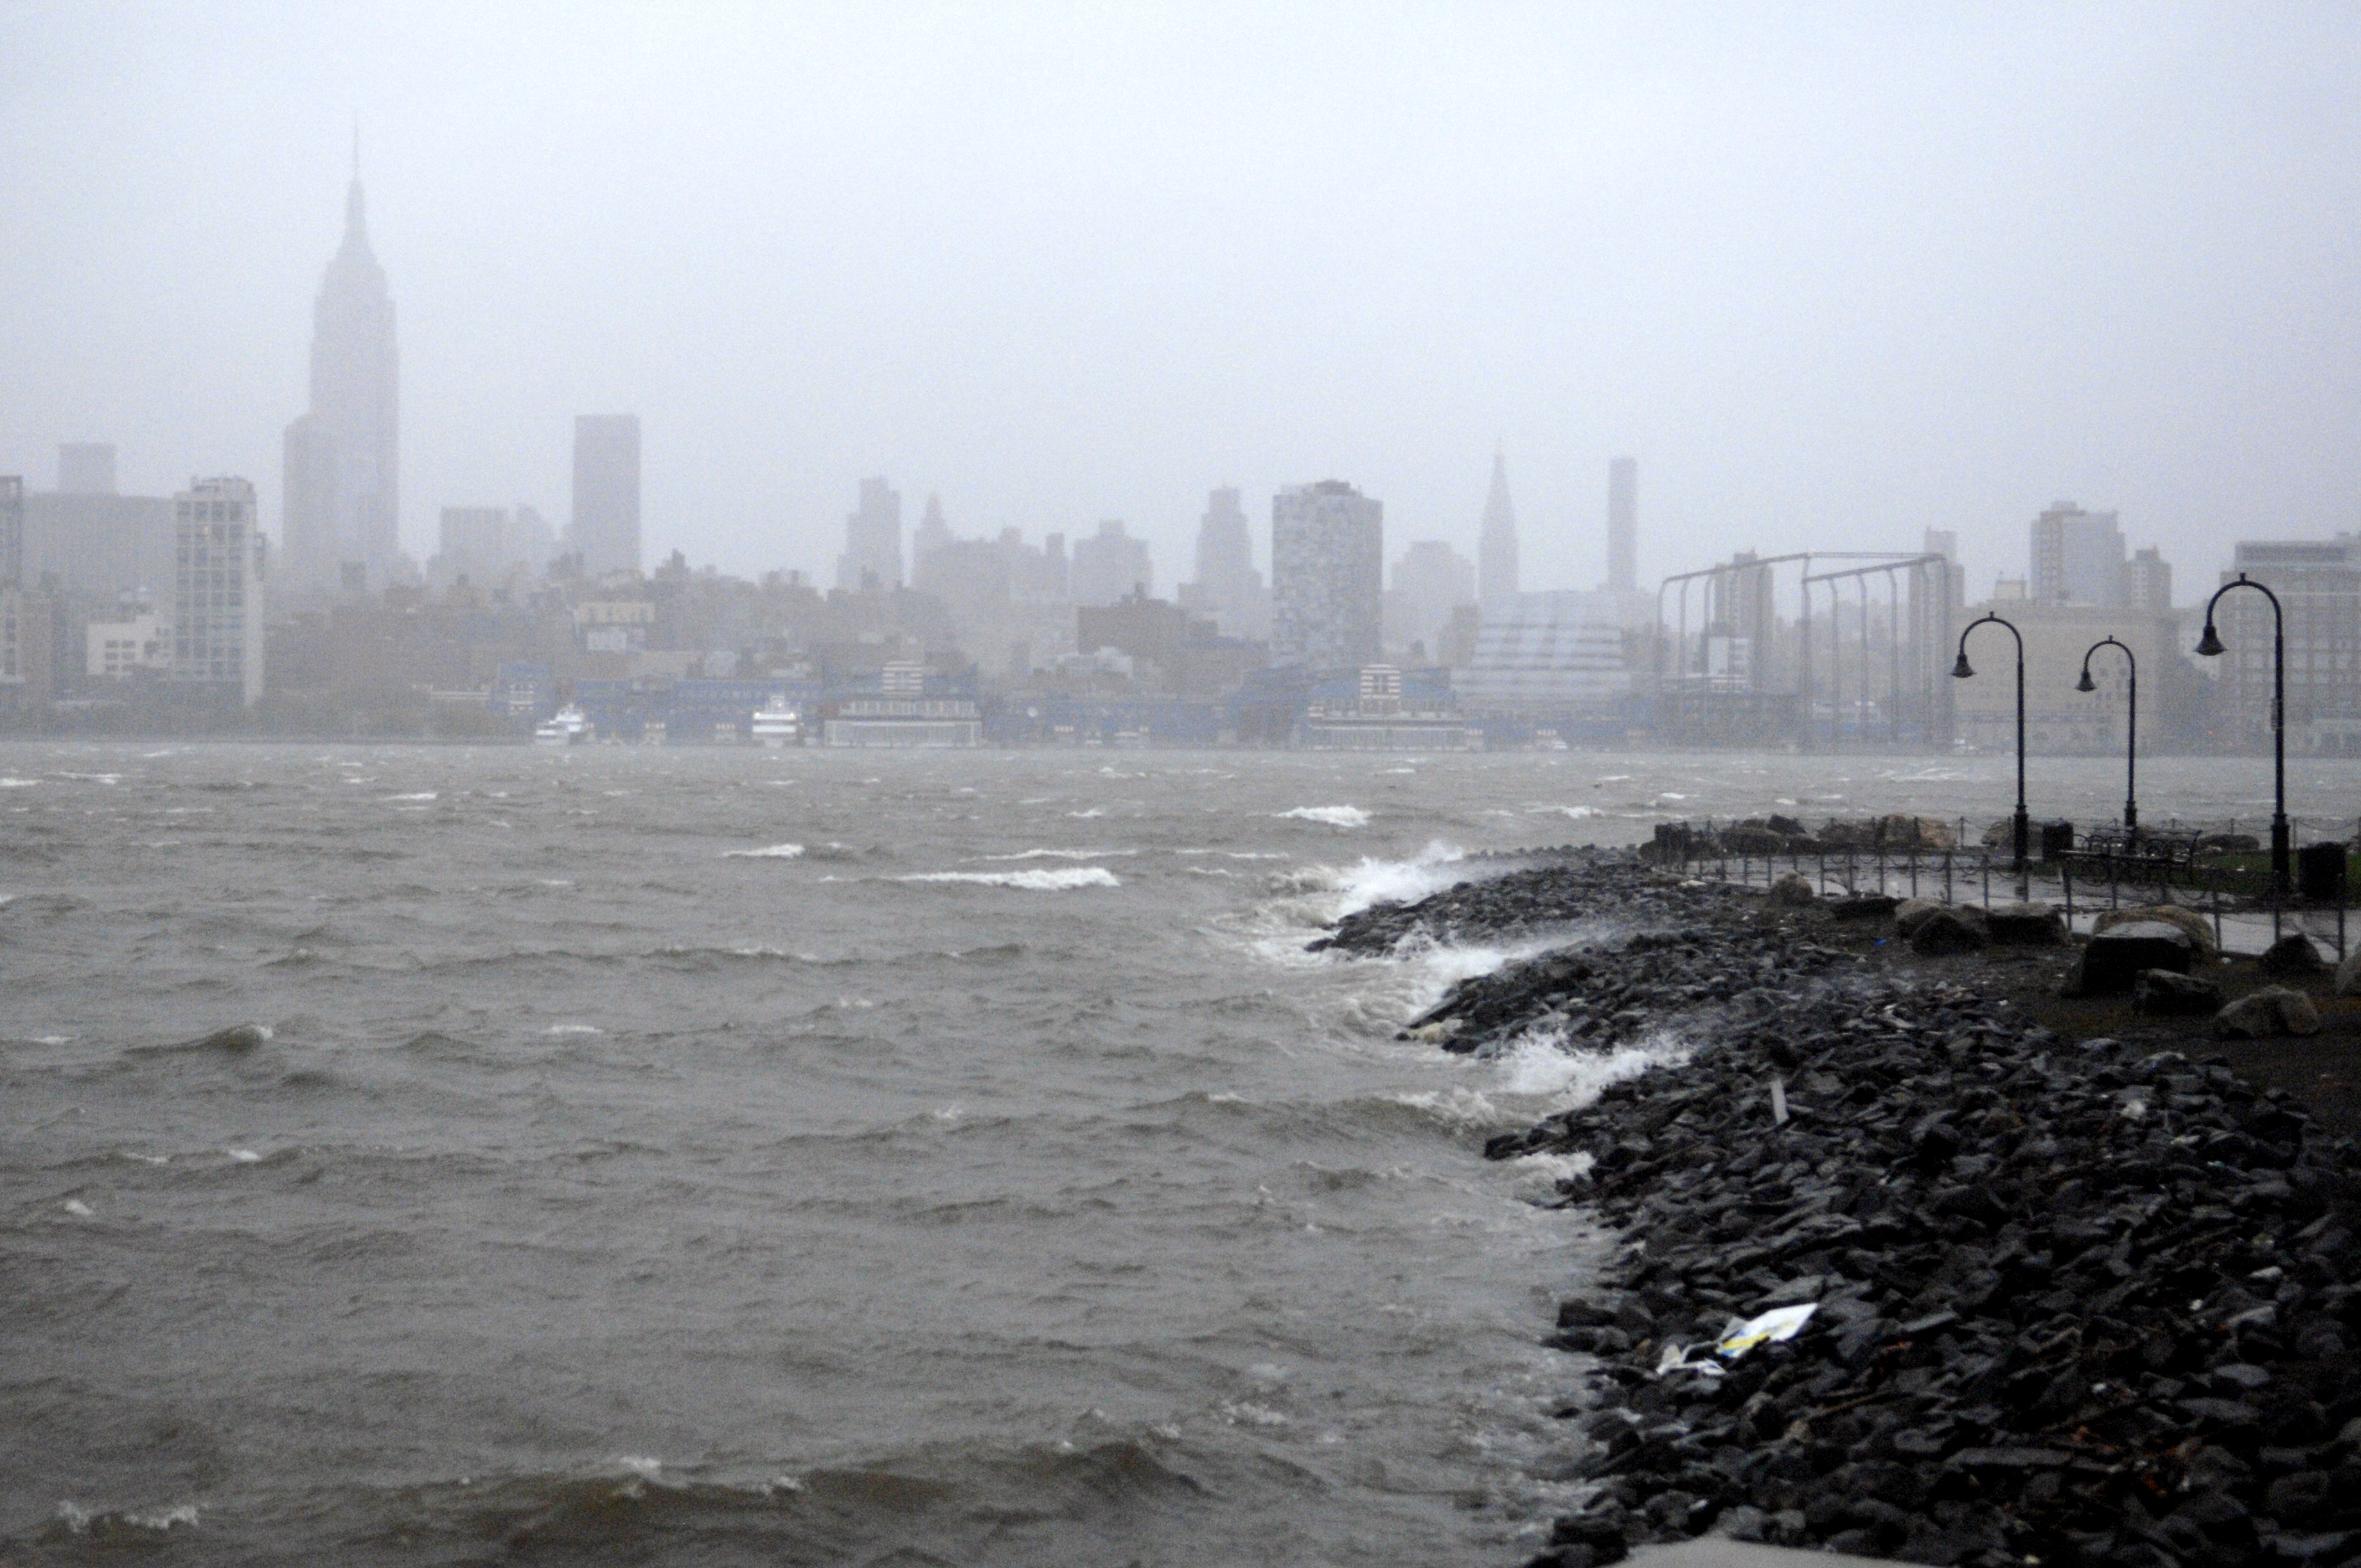 New York on the eve of Hurricane Sandy.